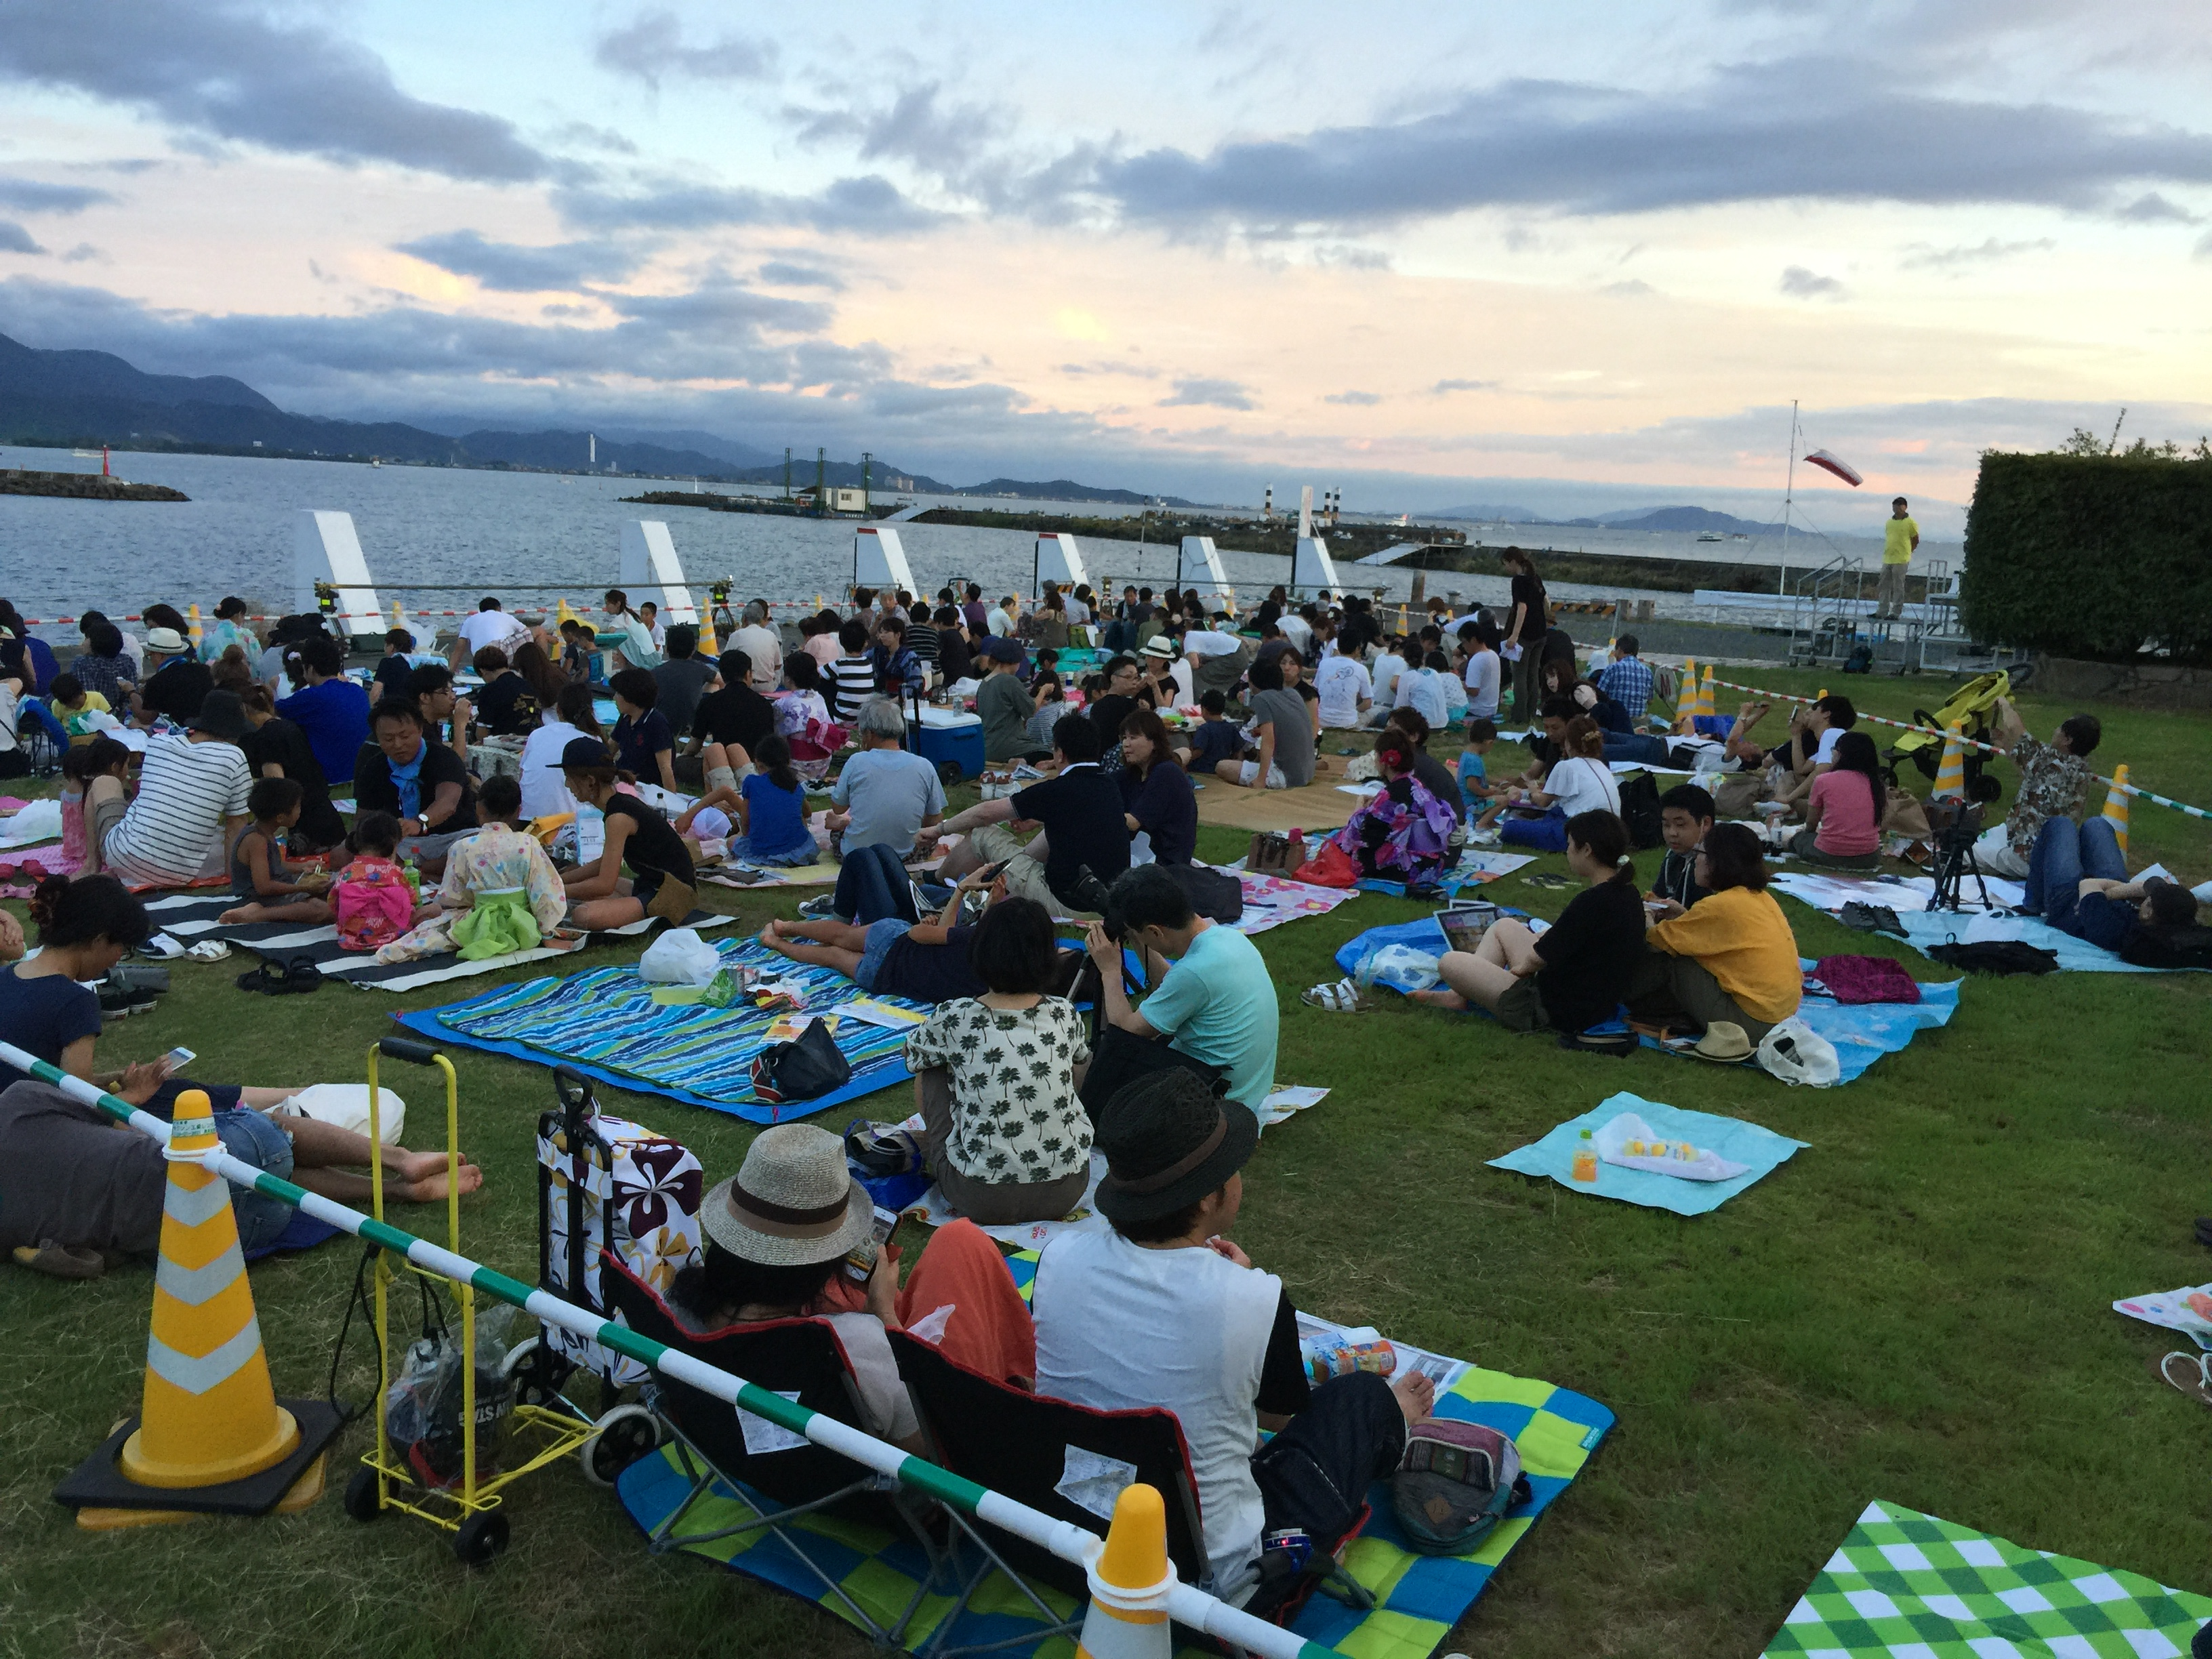 長浜・北びわ湖大花火大会2018一般席(エリア毎指定)